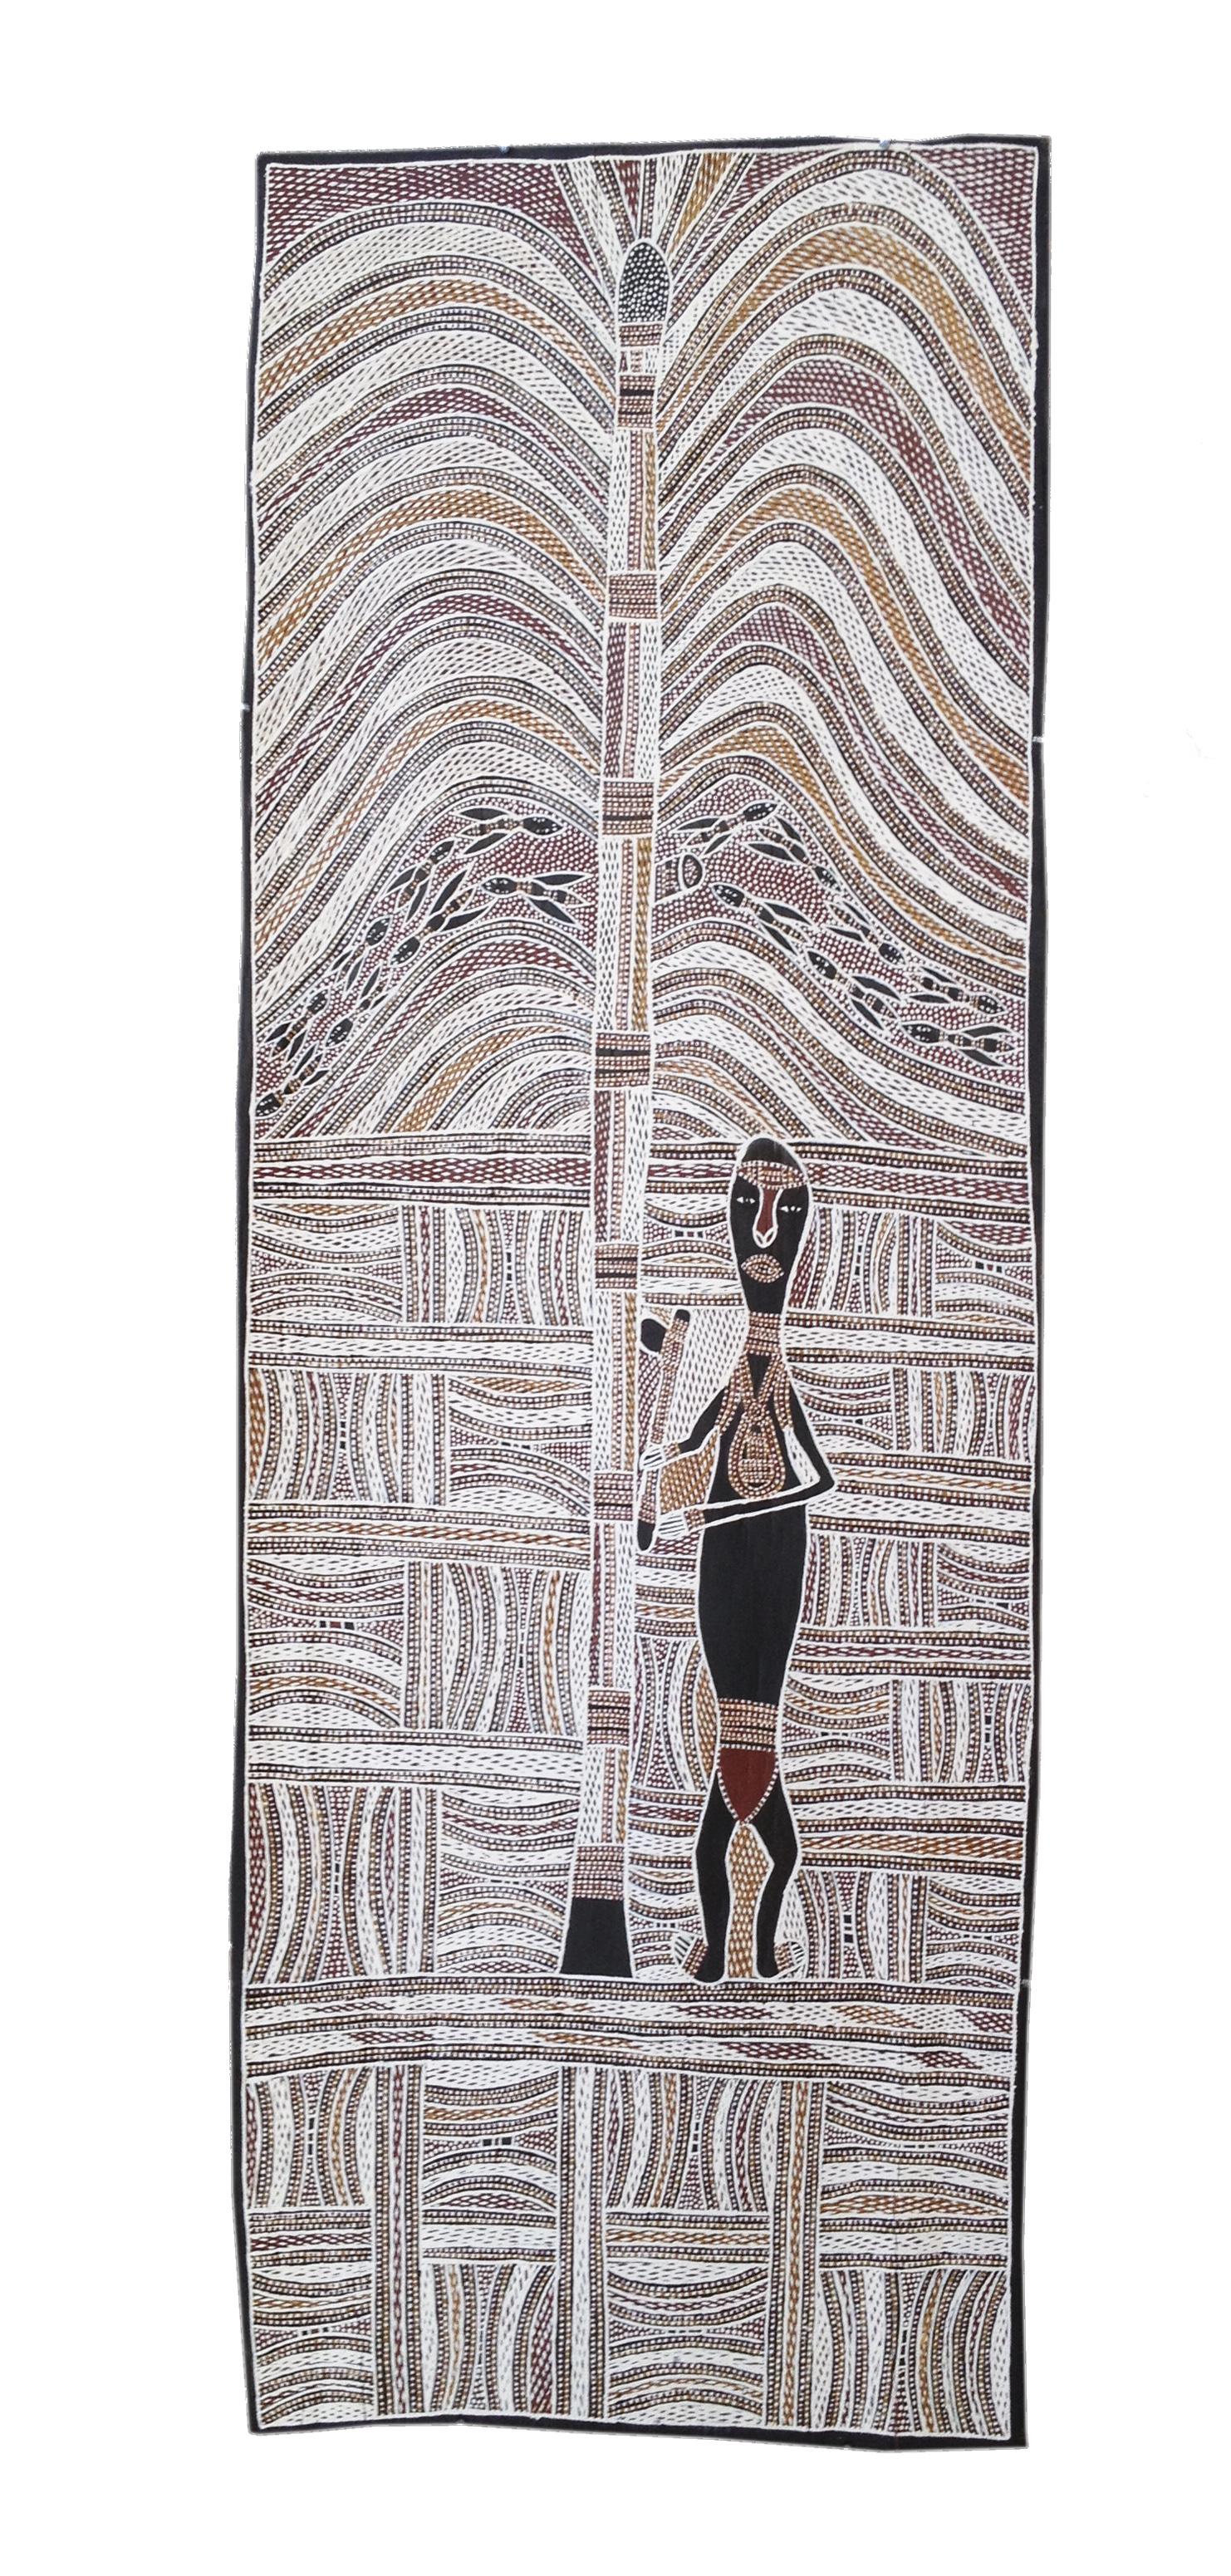 Wolpa Wanambi  Untitled  Natural earth pigments on bark 45 x 120cm  Buku Larrnggay Mulka #4375M   EMAIL INQUIRY